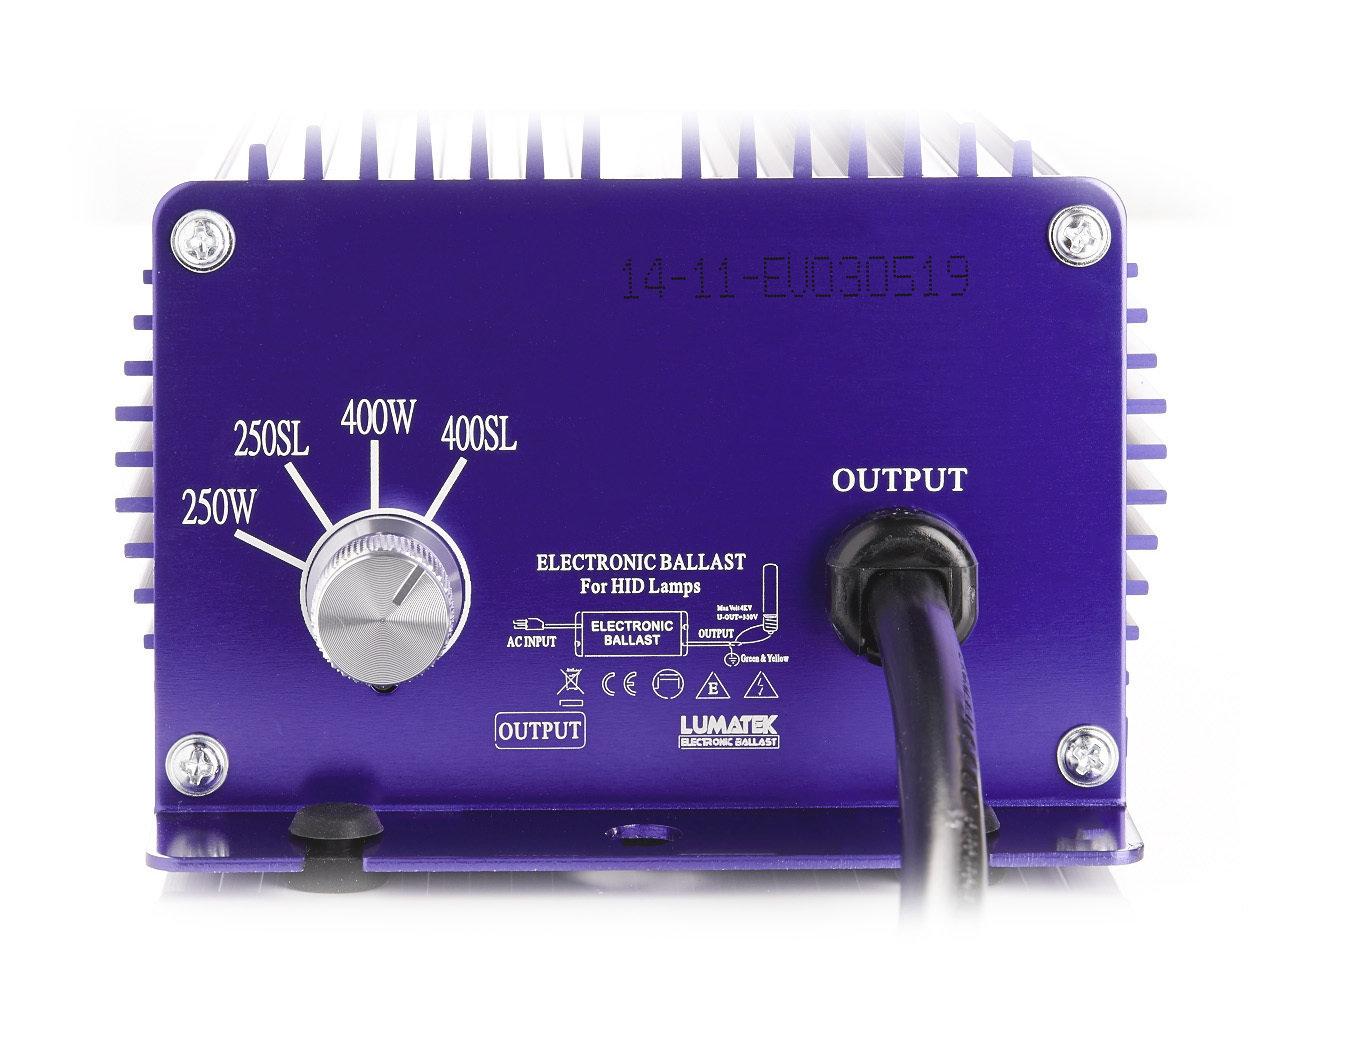 Балласт Lumatek 400-250W для HPS (ДНАТ) и MH (МГЛ) ламп